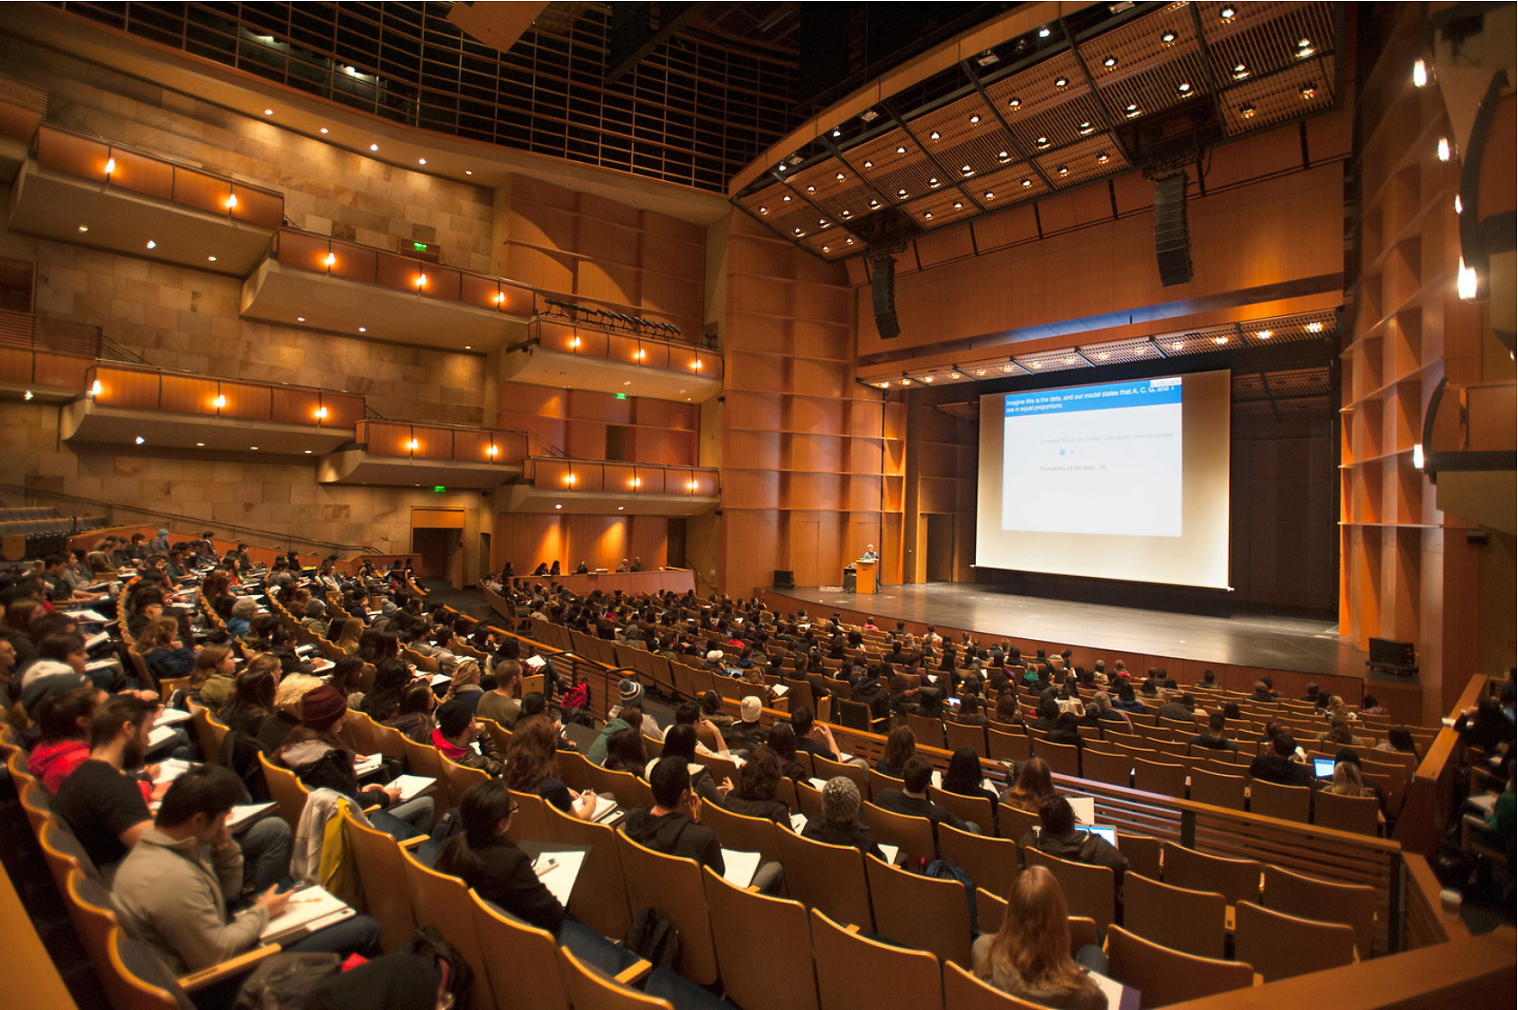 Mondavi Center Receives Grant to Integrate the Arts, Humanities